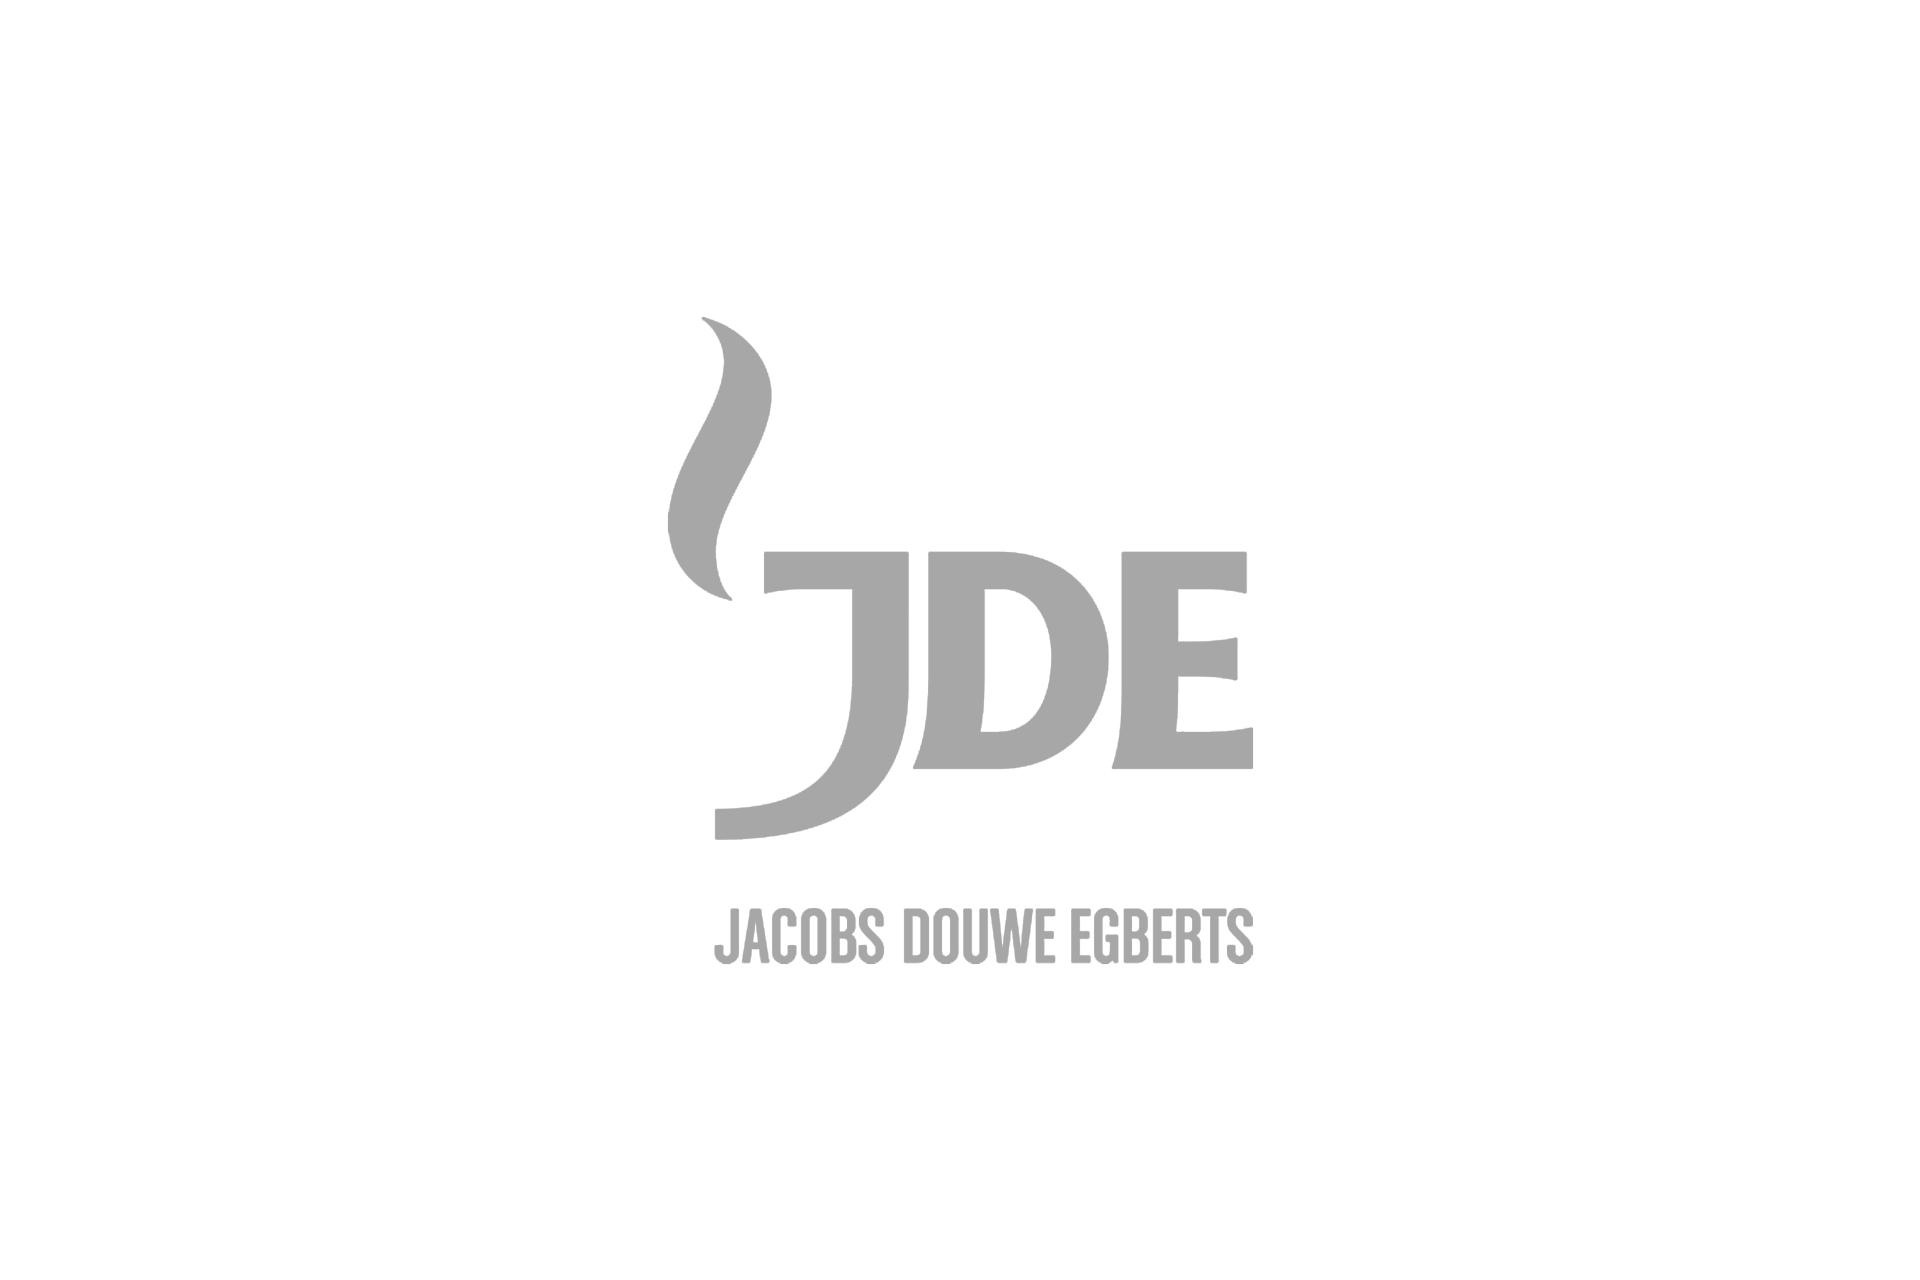 JDE logo grey